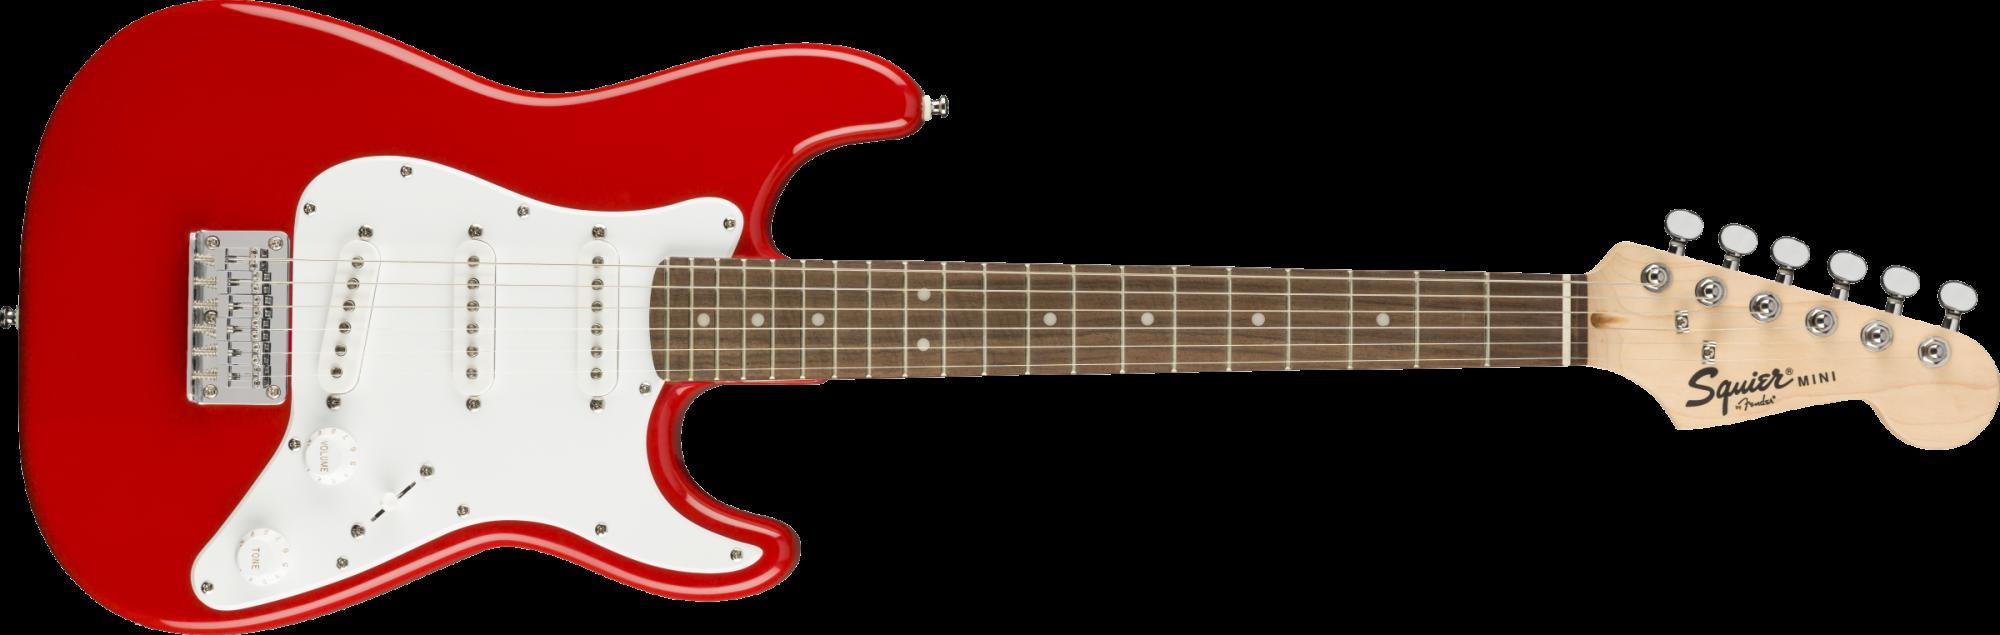 Squier Mini Stratocaster Laurel Fingerboard Torino Red